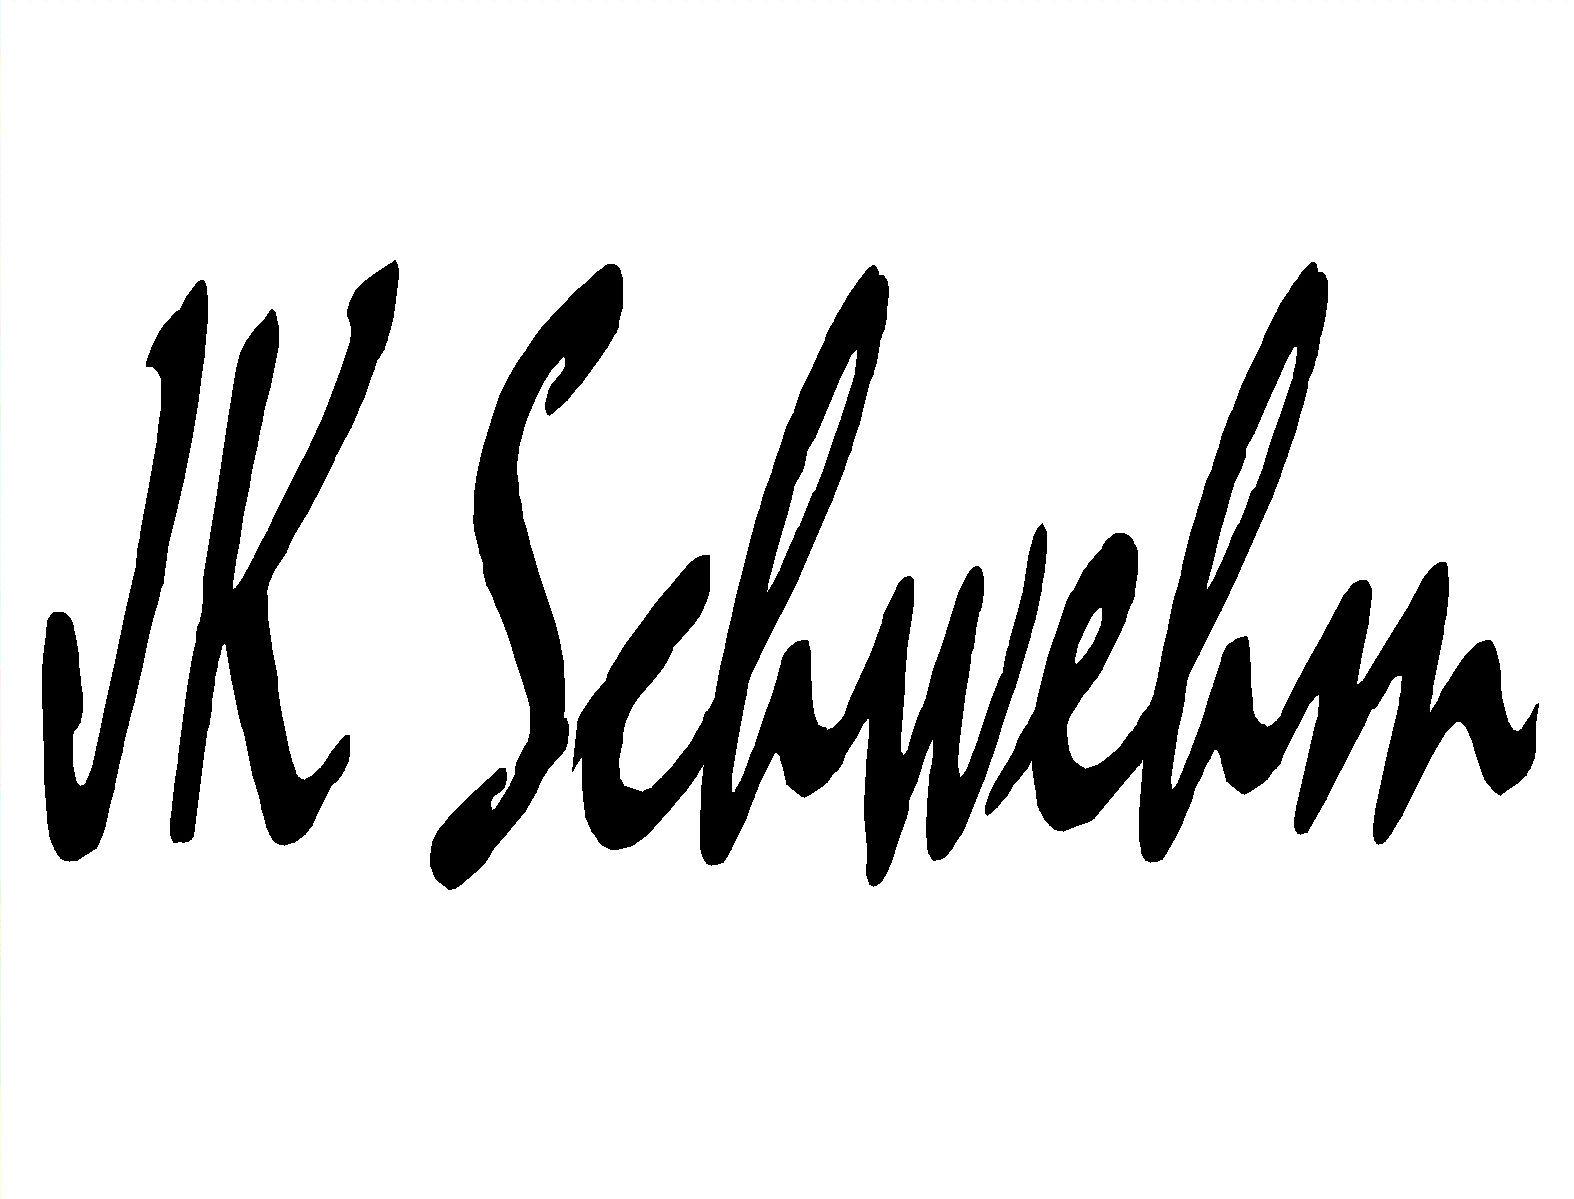 JK Schwehm Signature